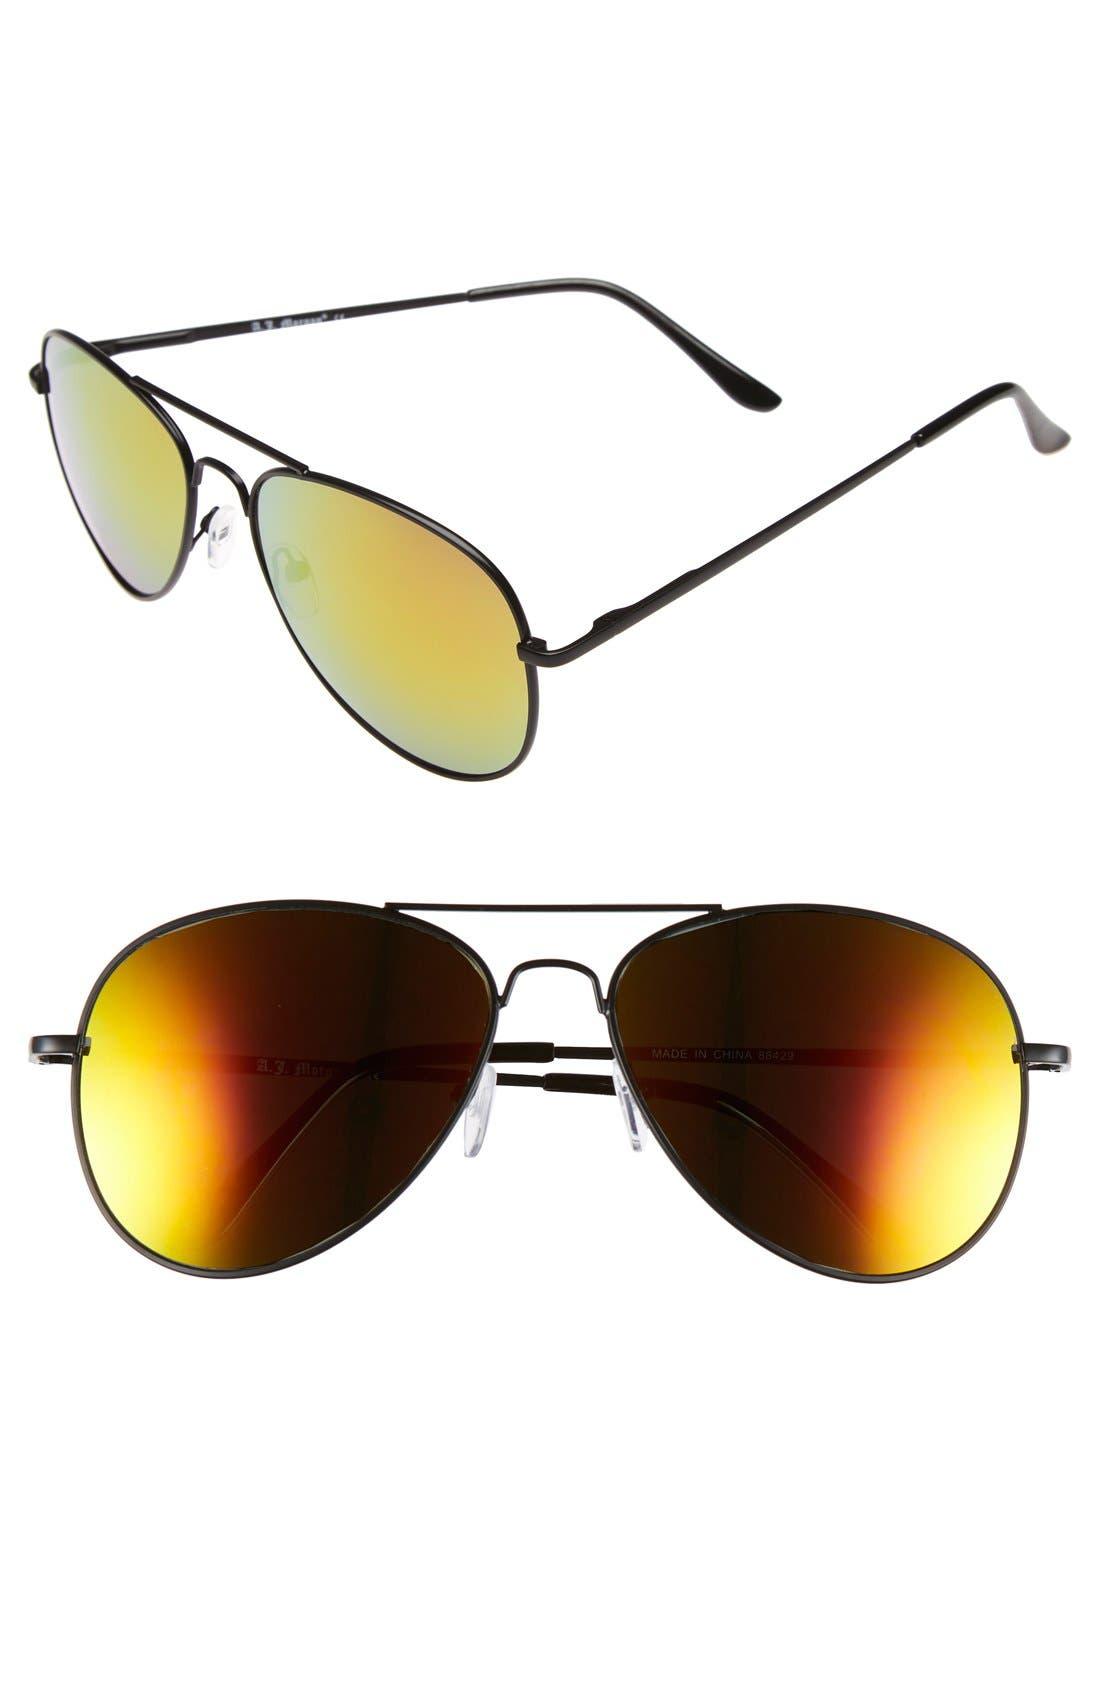 Main Image - A.J. Morgan 'Skyline' 58mm Aviator Sunglasses